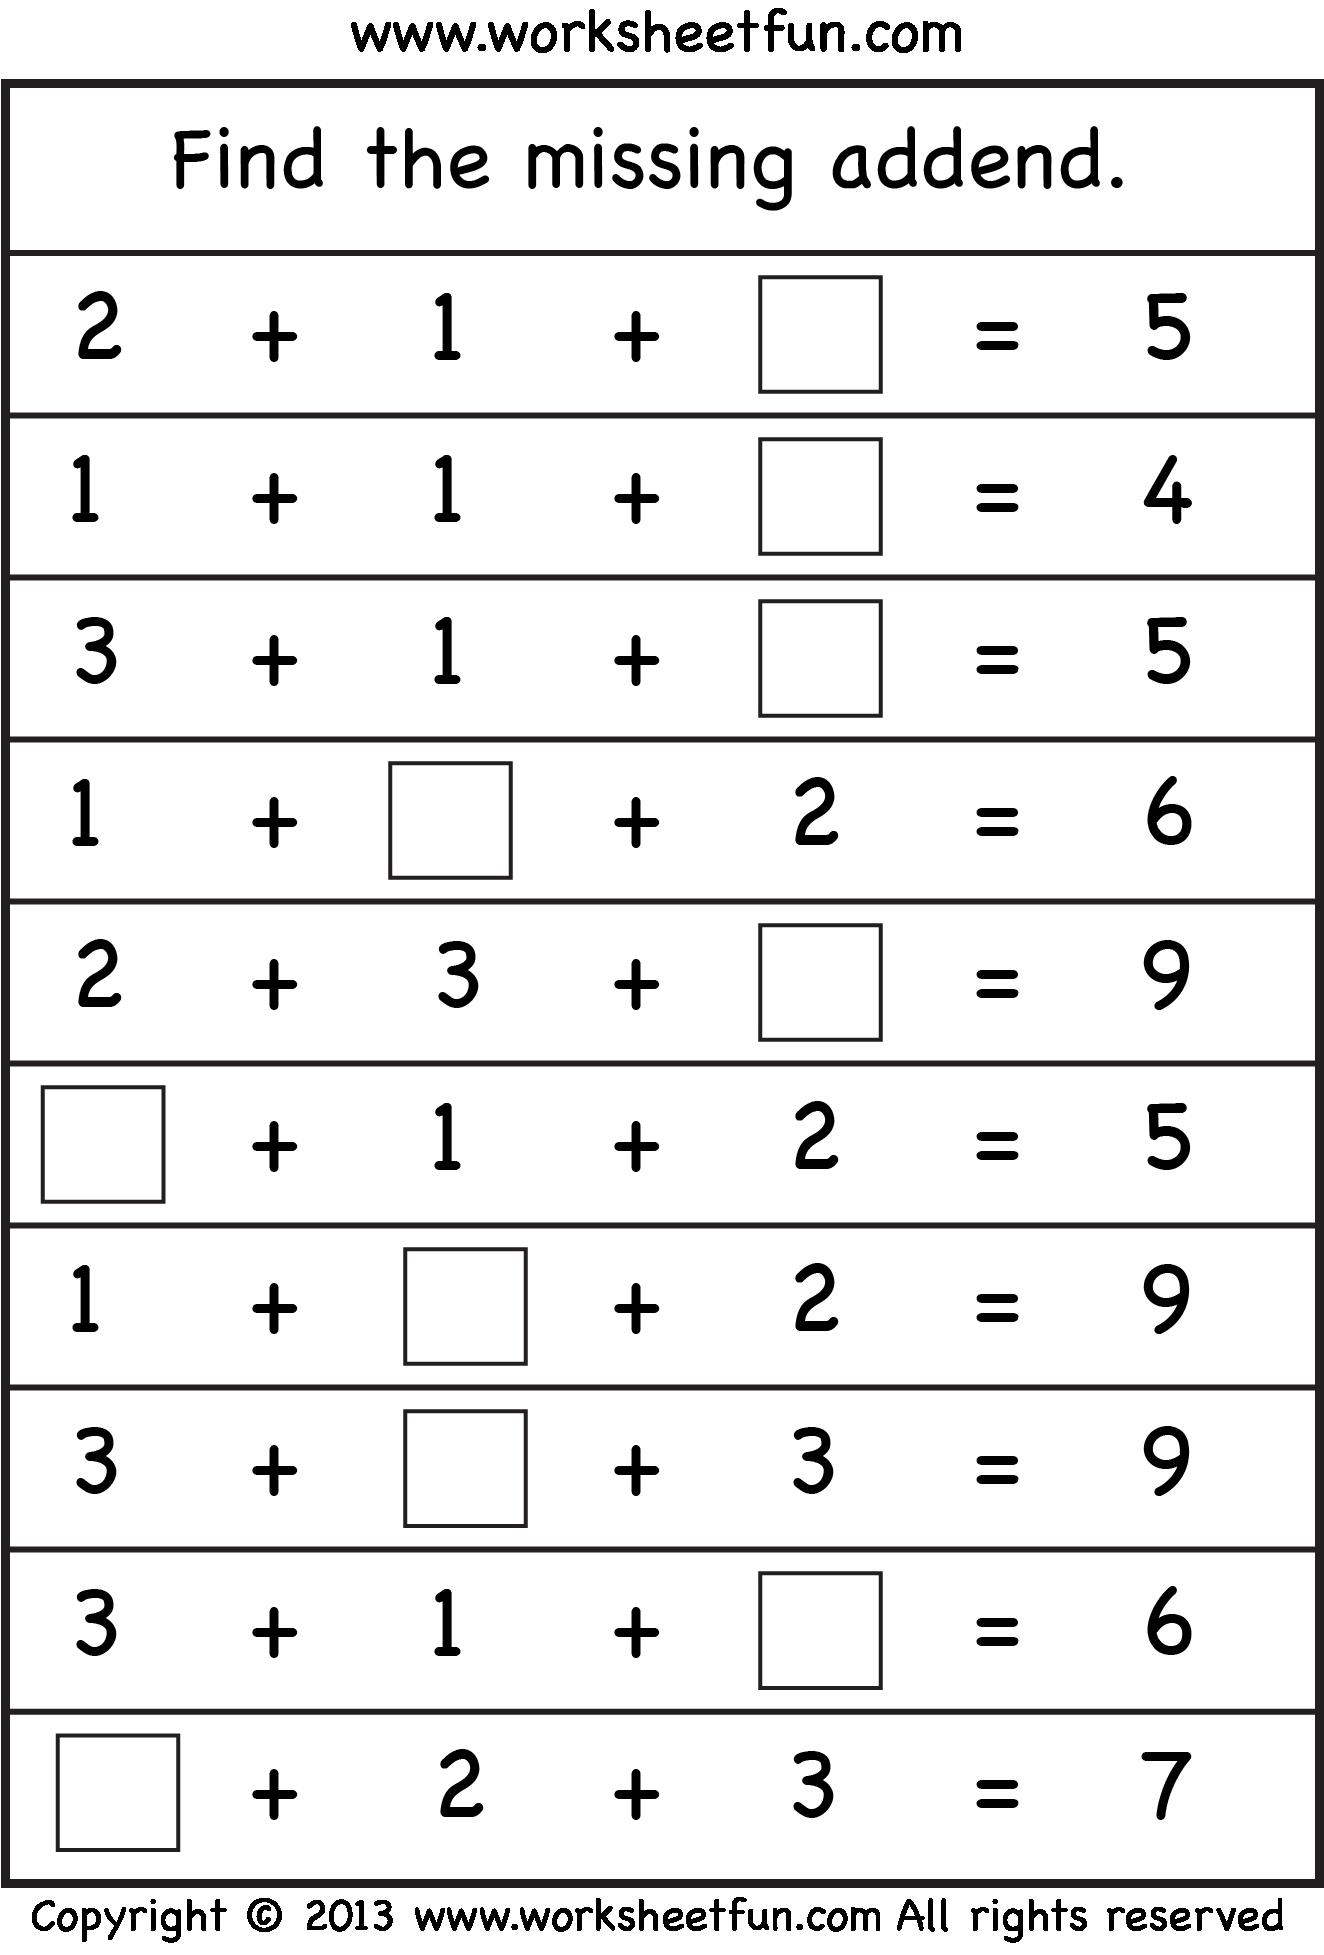 Missing Addend Four Worksheets Free Printable Worksheets First Grade Math Worksheets First Grade Worksheets 1st Grade Math Worksheets [ 1955 x 1324 Pixel ]